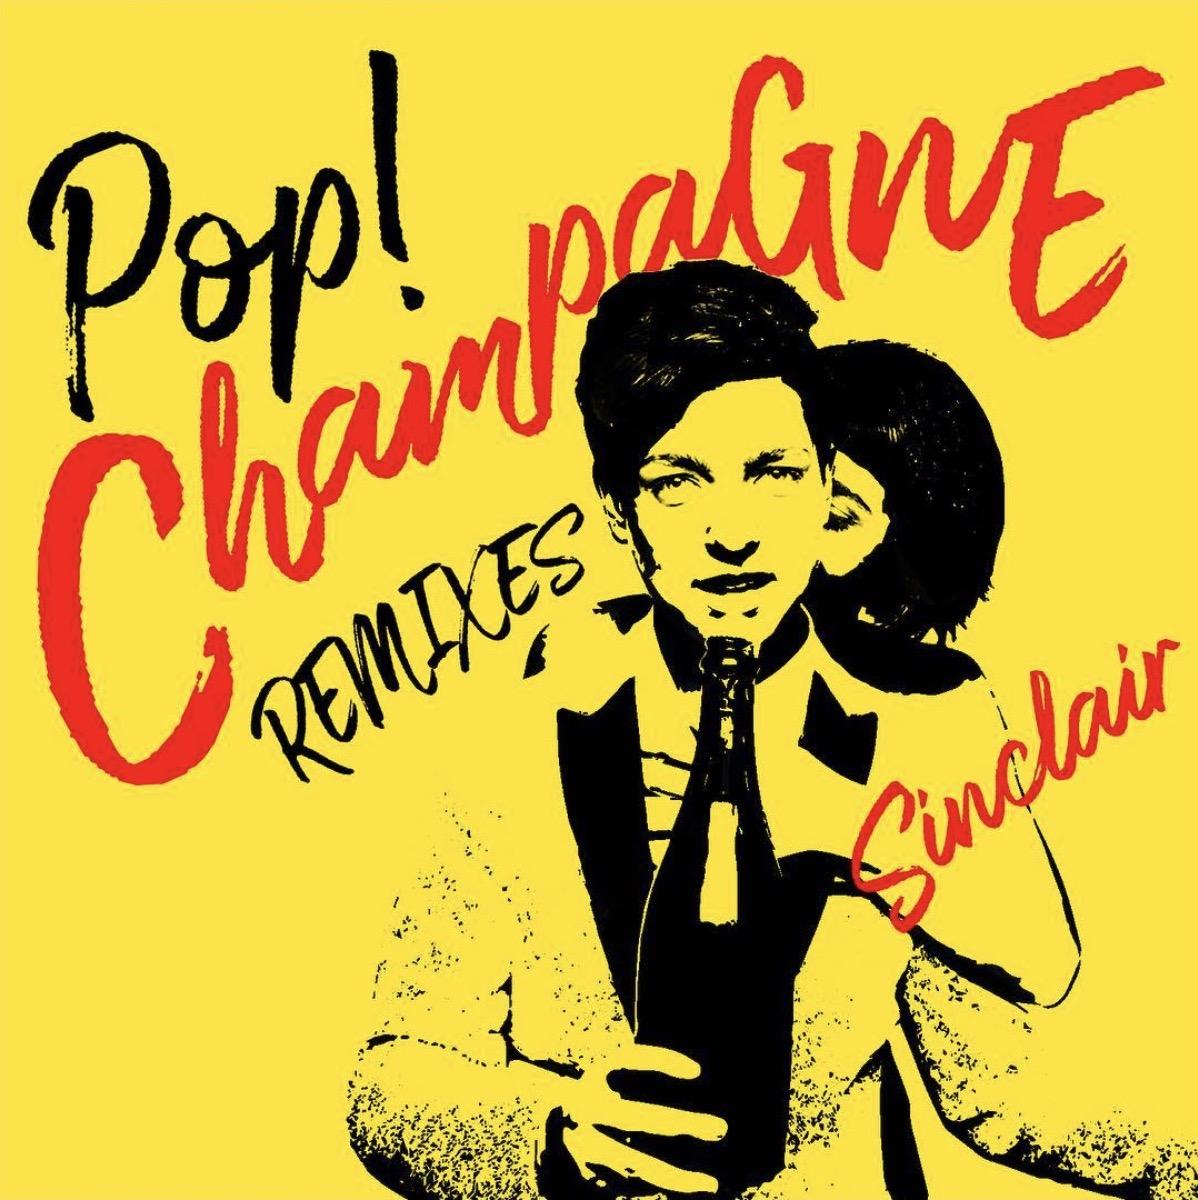 Pop Champagne Remix Artwork.jpg